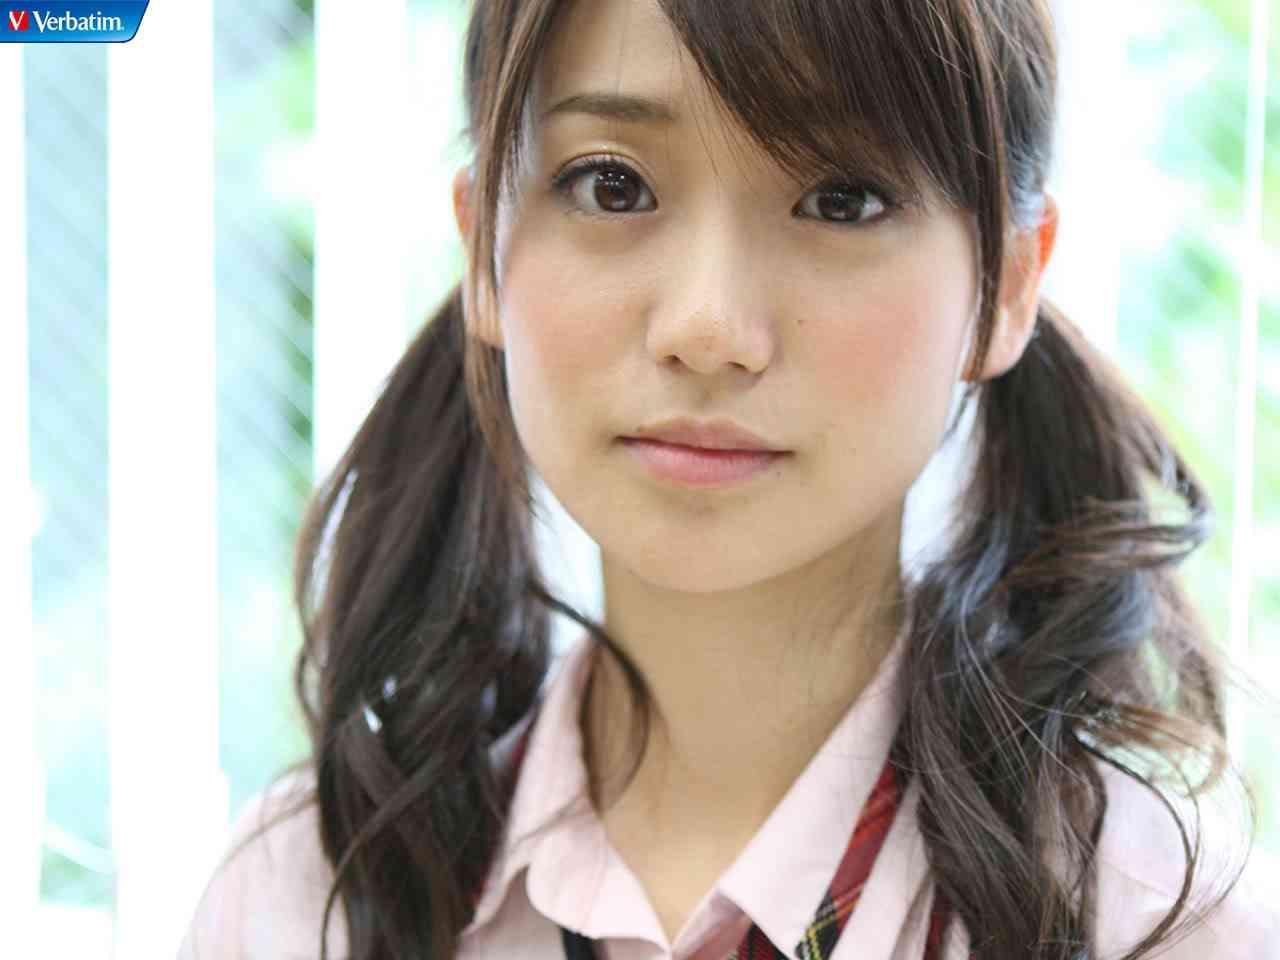 AKB48大島優子、主演大型ドラマがお蔵入り